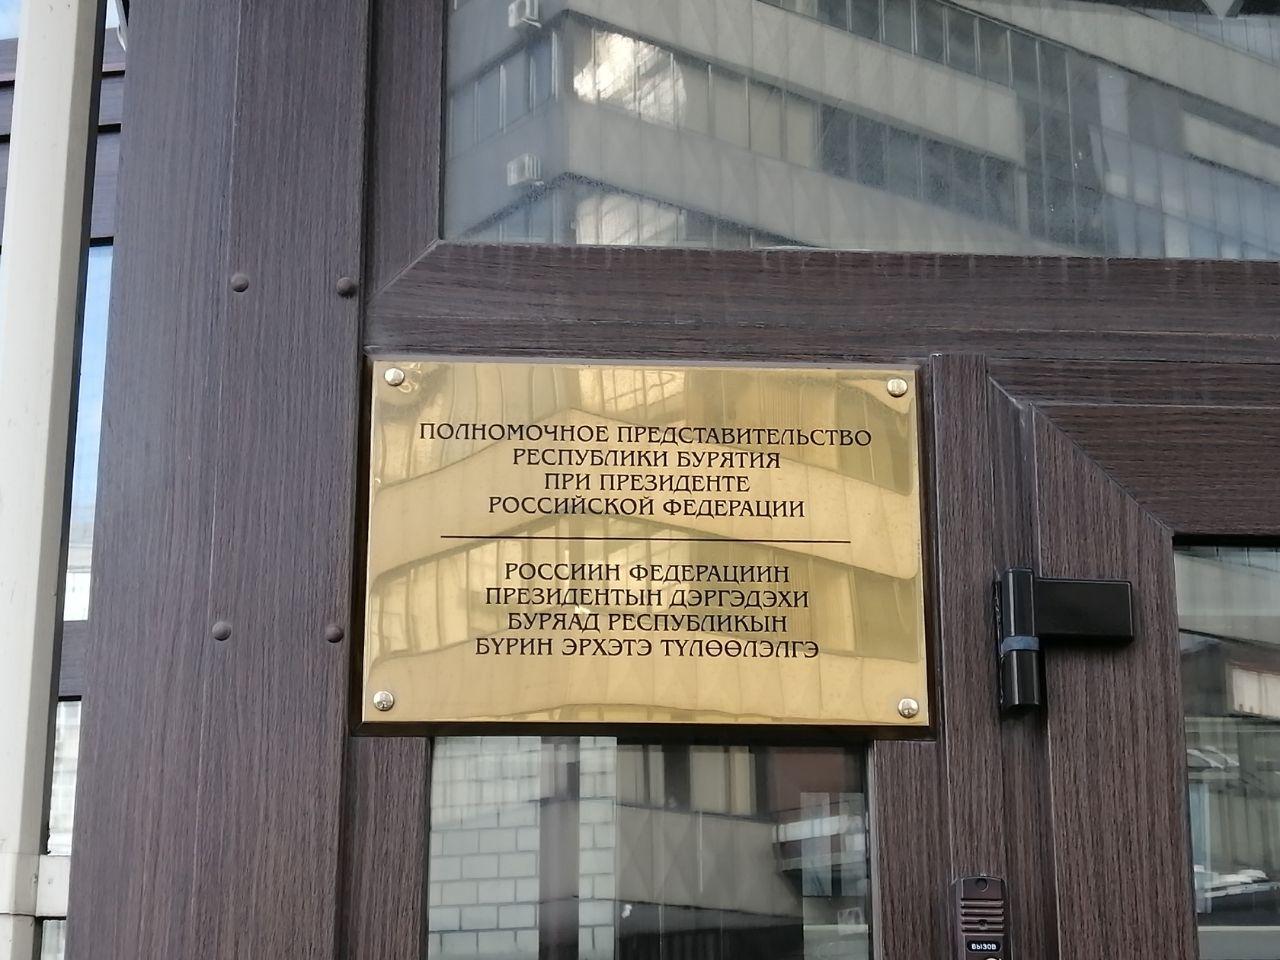 аренда помещений в БЦ на ул. Мясницкая, 43с2